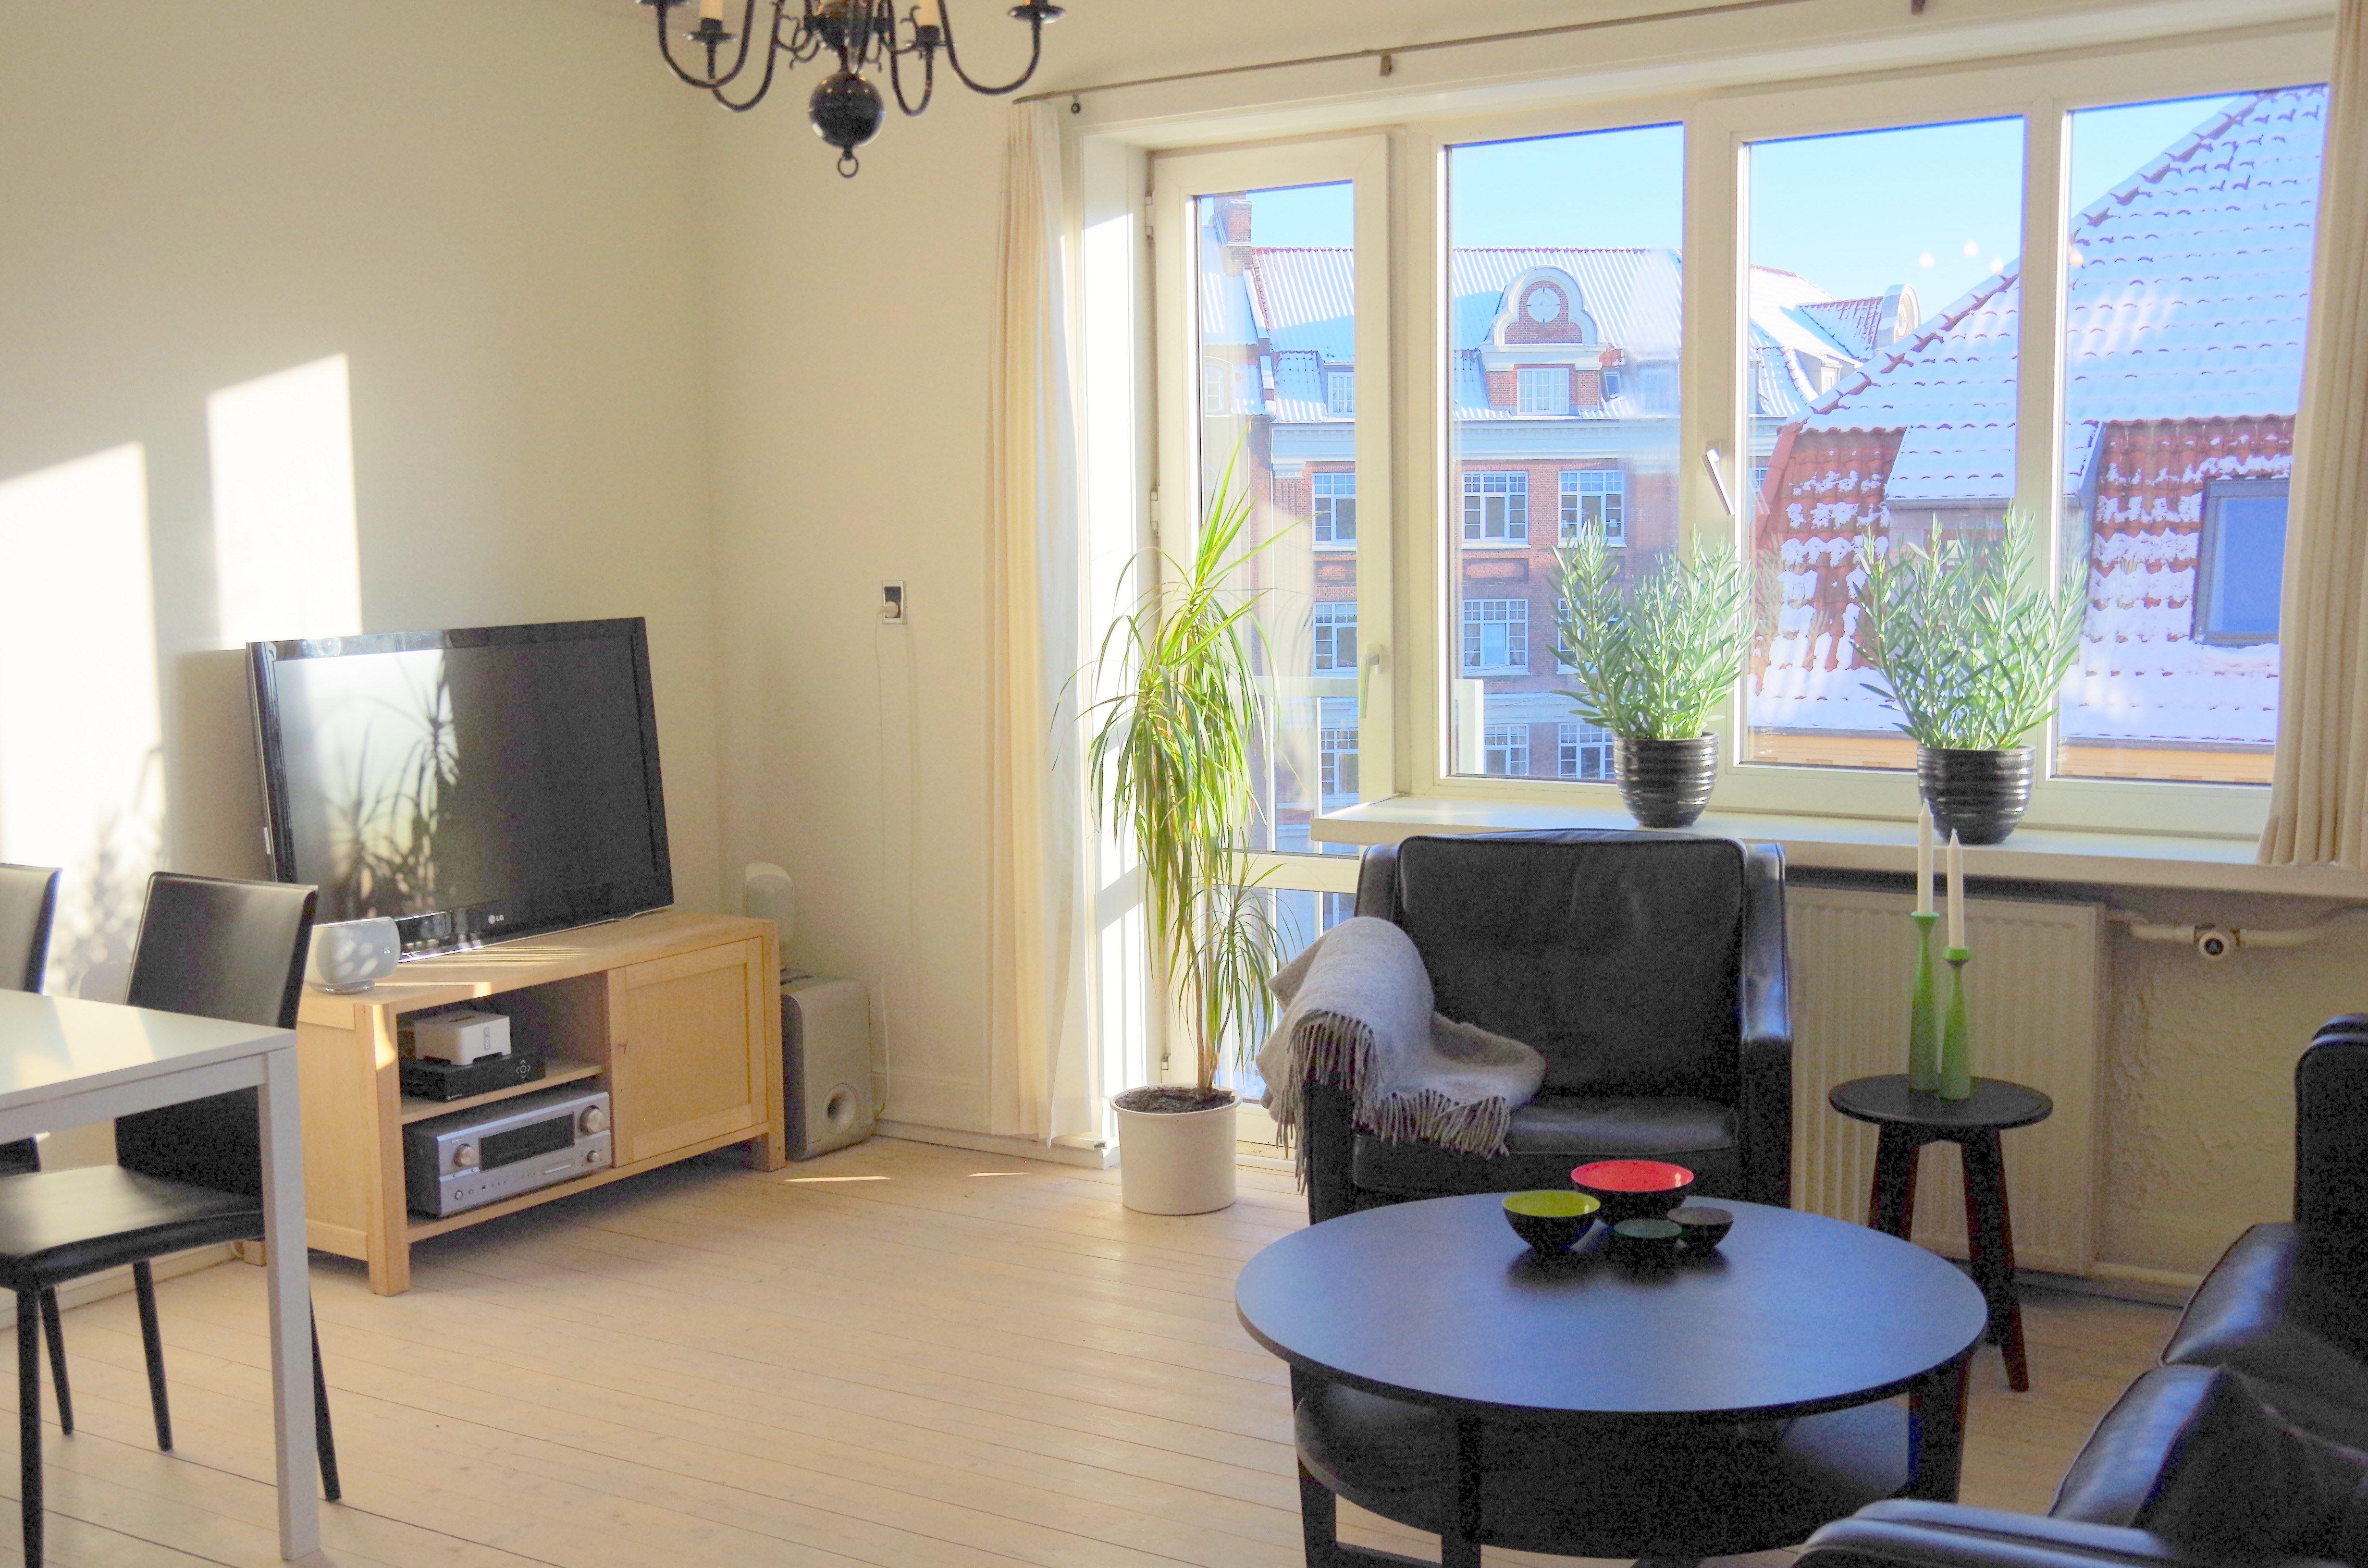 Prinsensgade 39, 3. th., 9000 Aalborg